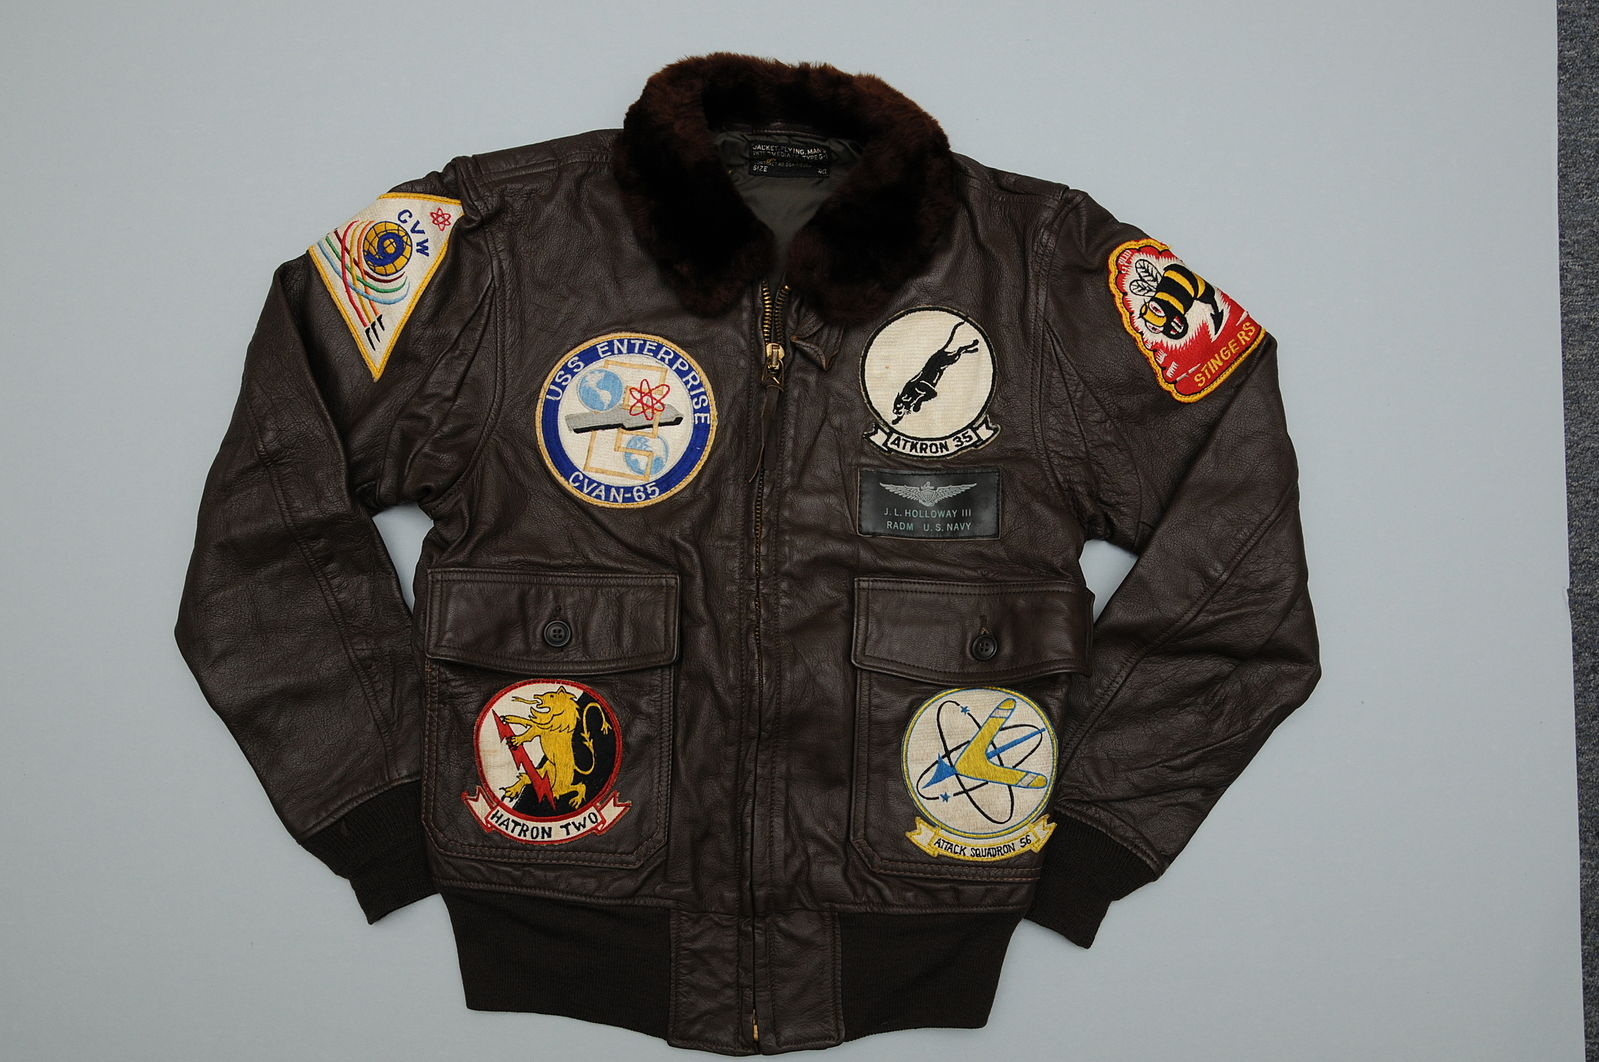 WW2 flying jacket